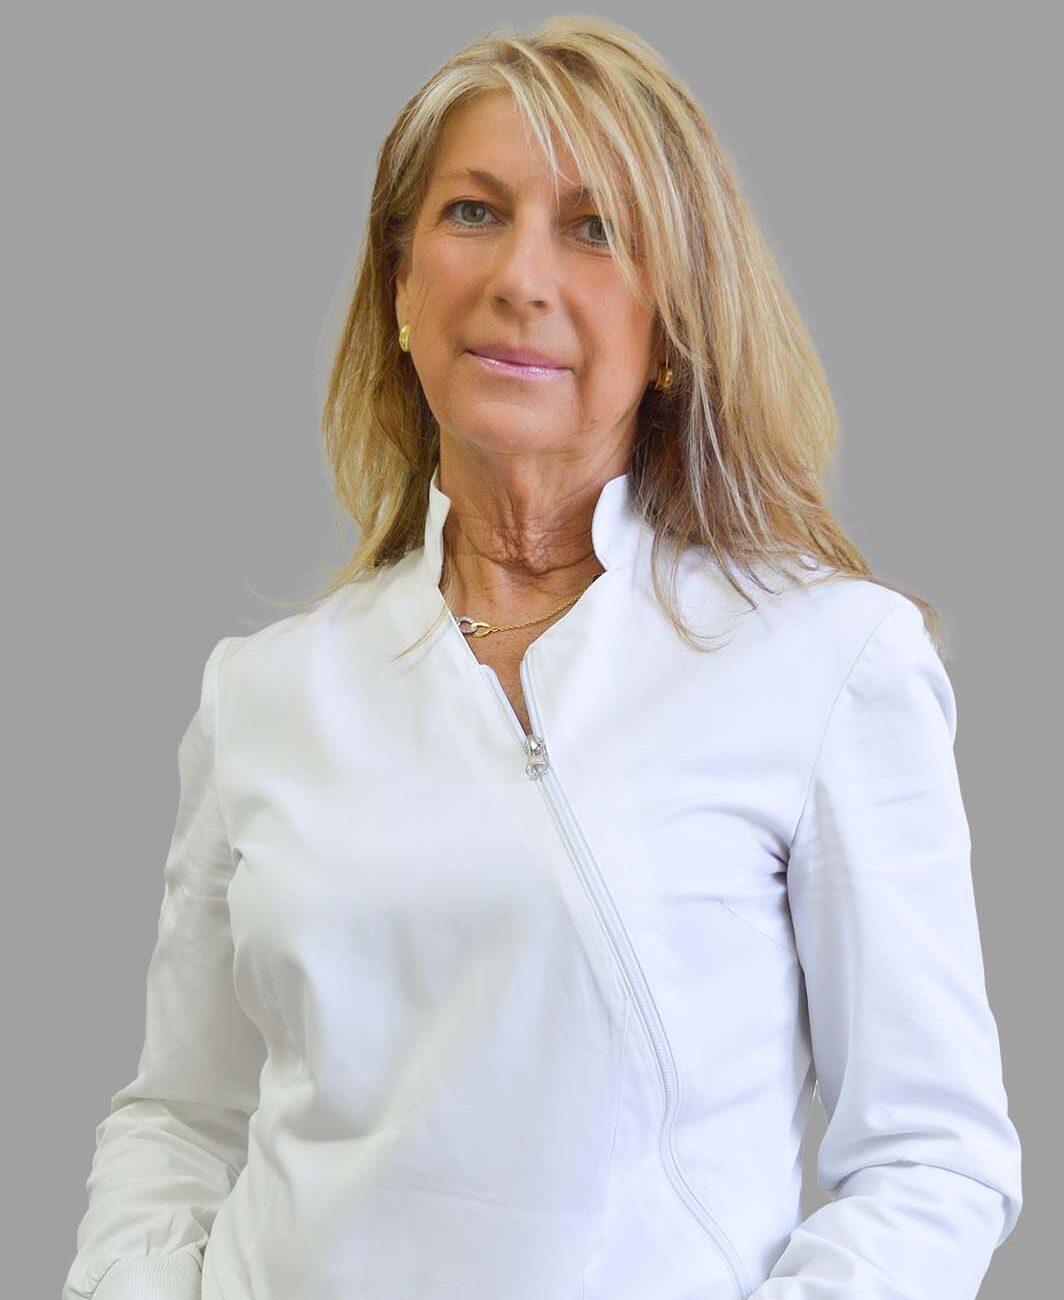 Paola Franca